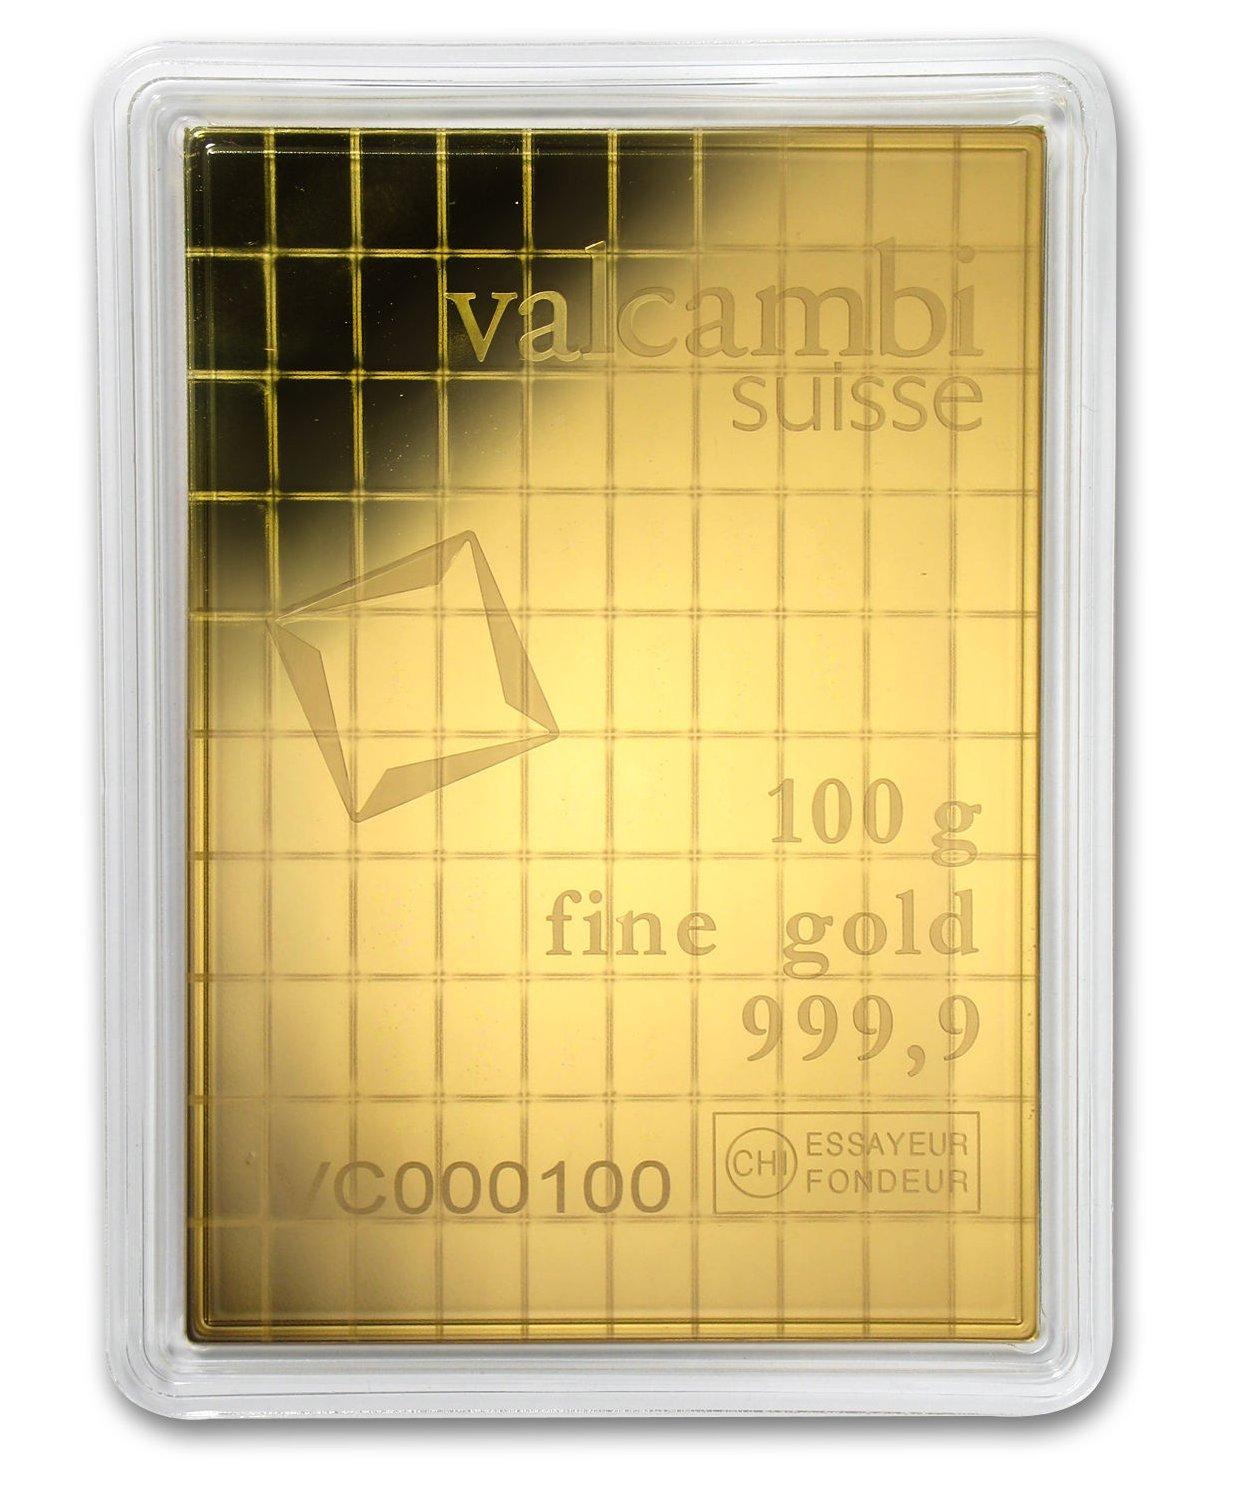 100x 1 gram Gold CombiBar - Valcambi (In Assay)